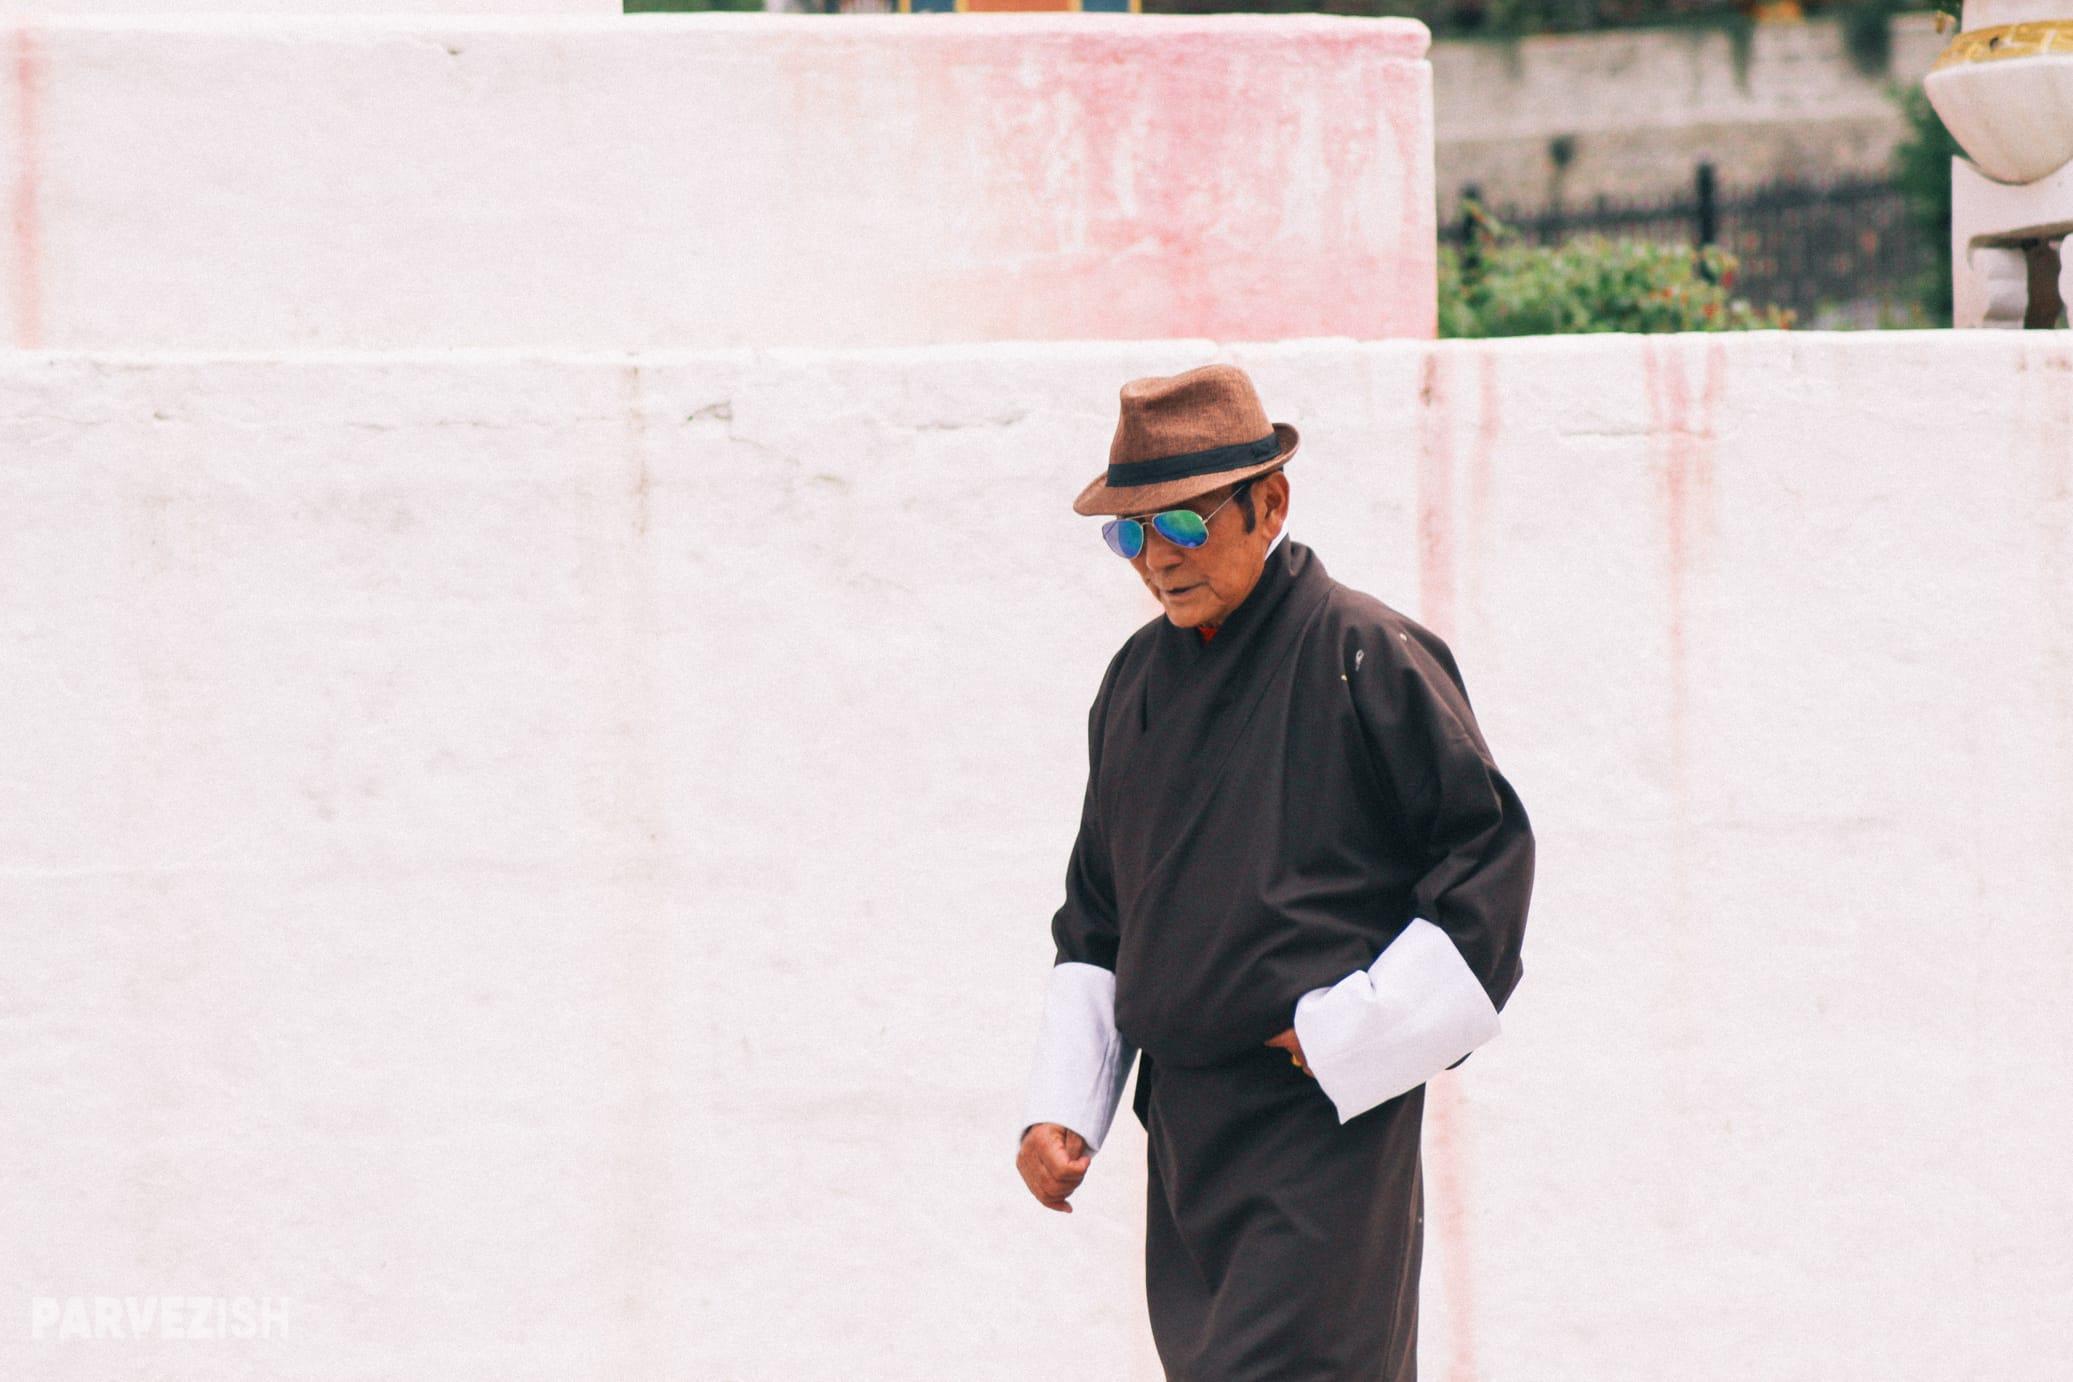 A Man Circumambulating at Memorial Chorten Bhutan